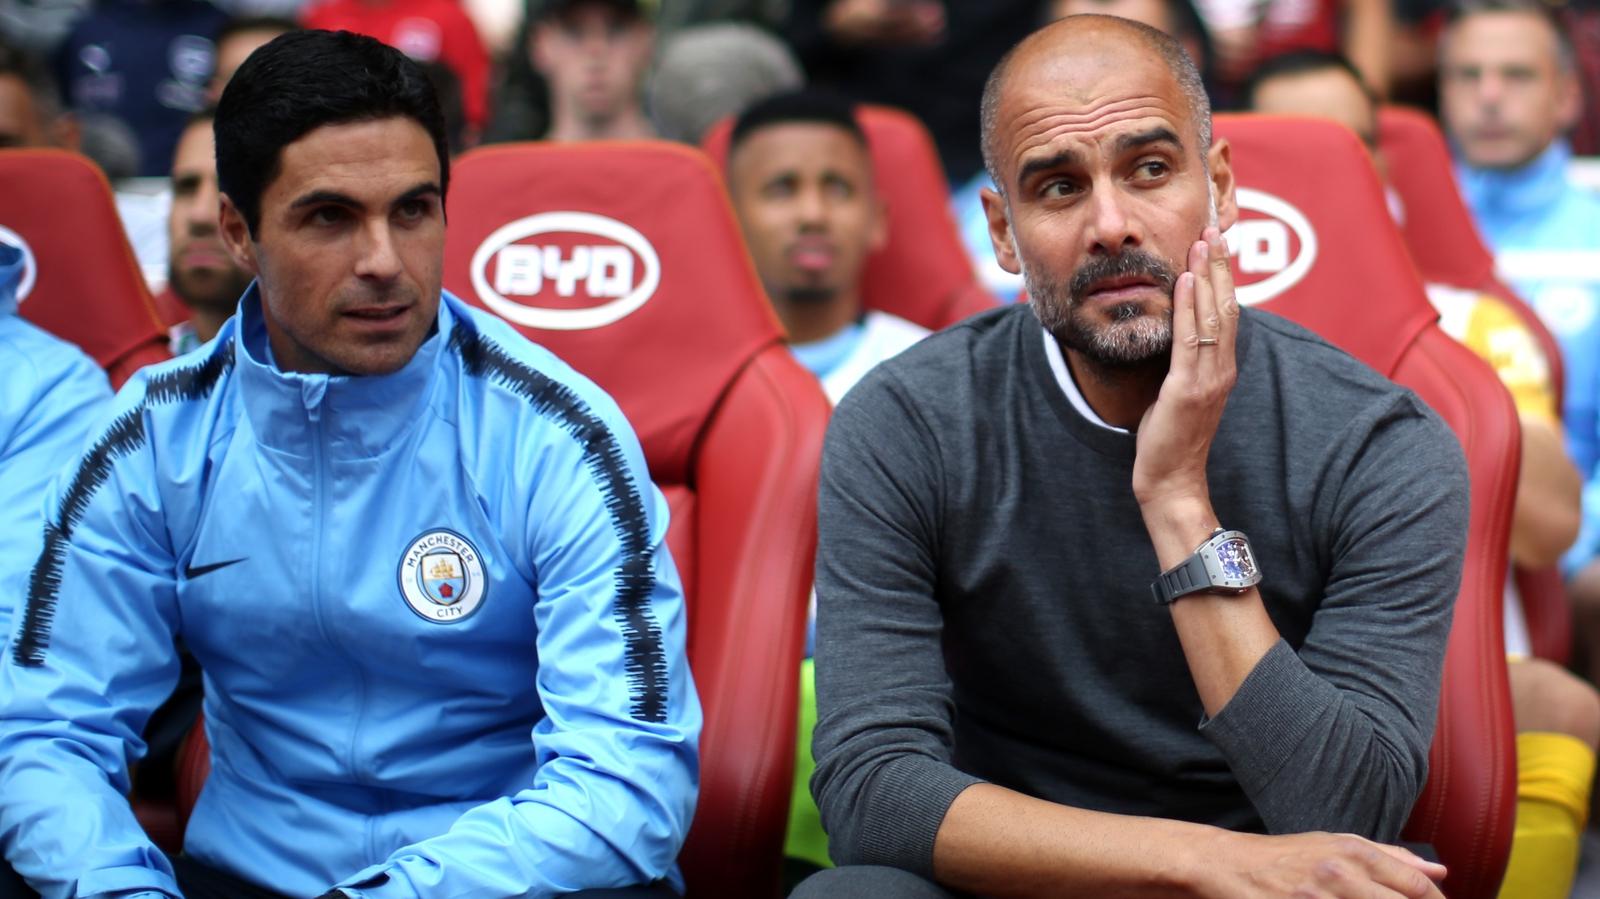 Arteta staying with City this season - Guardiola